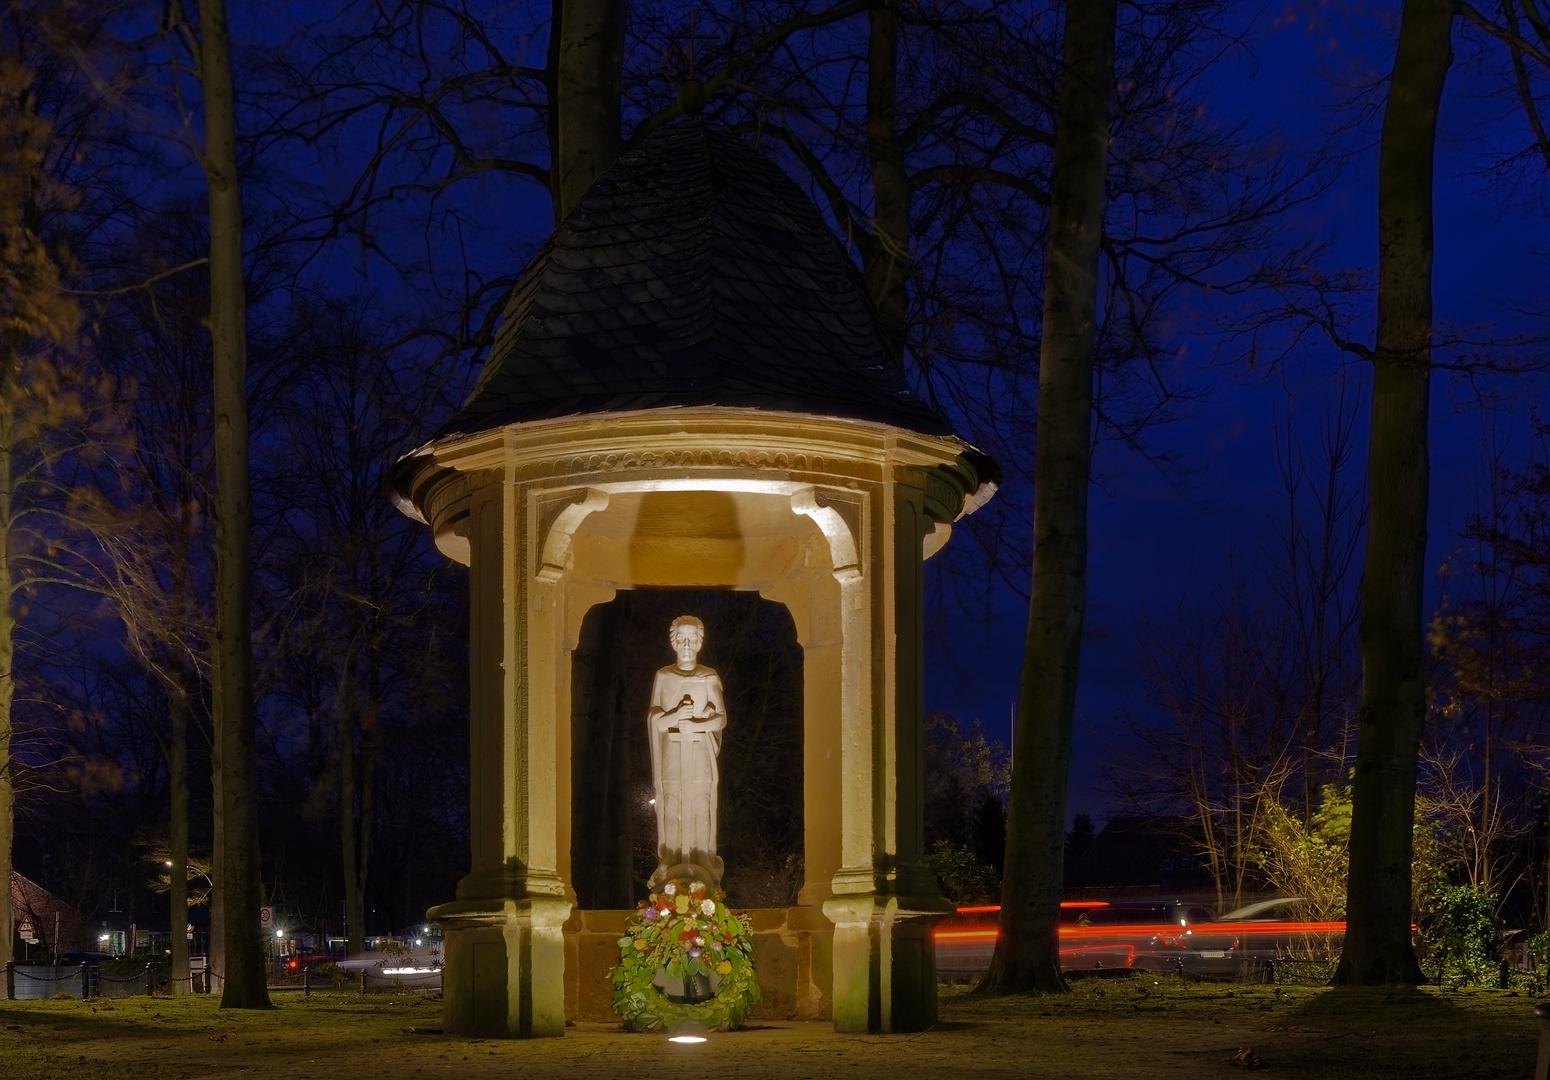 Ehrenmal in Marienfeld